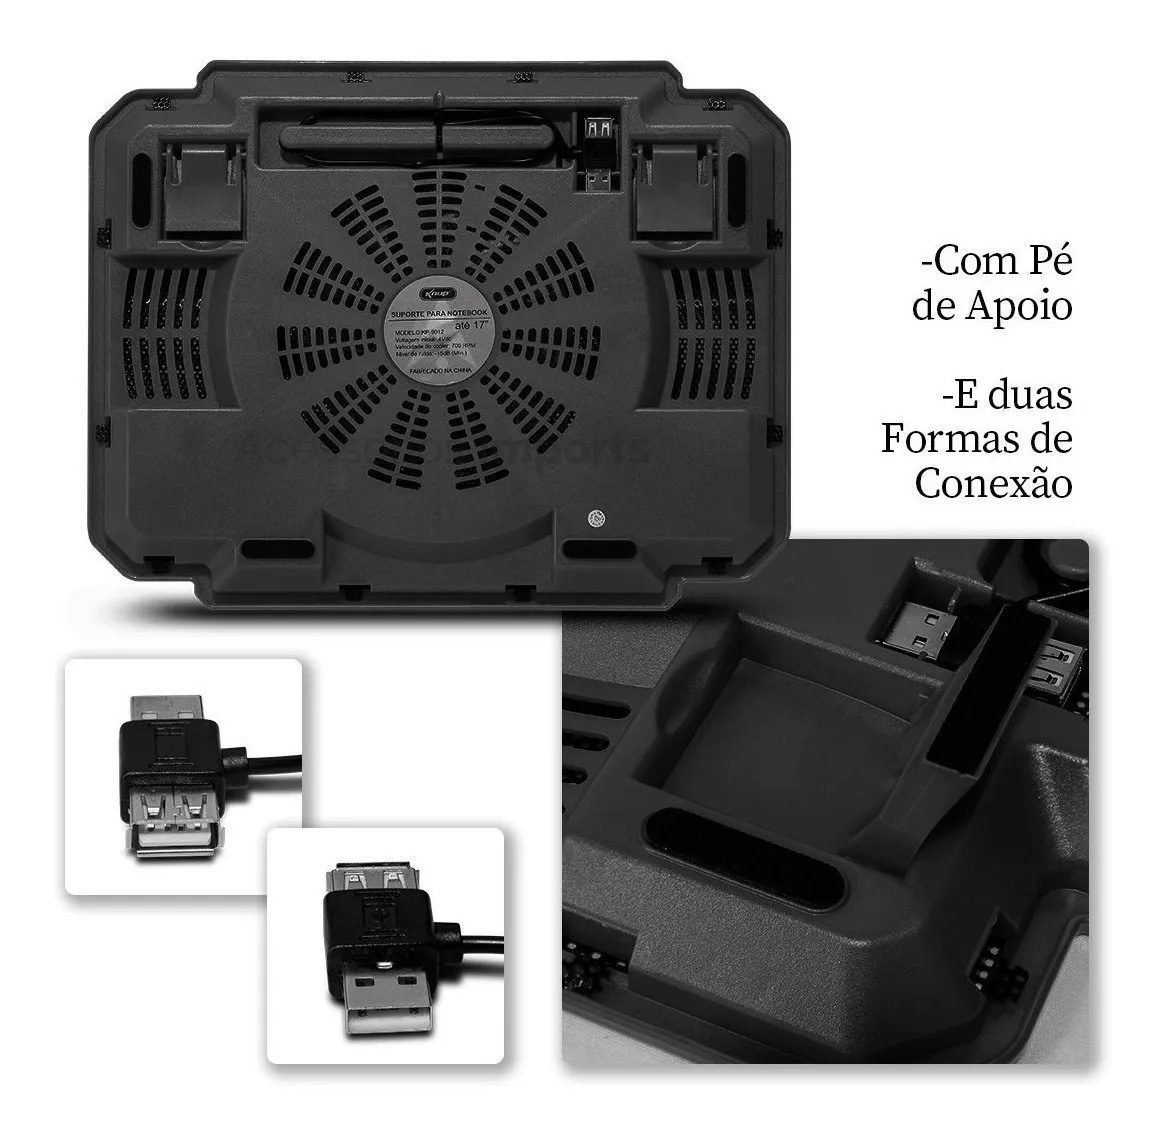 "Base cooler Suporte Para Notebook até 15,4"" Knup Kp-9014"